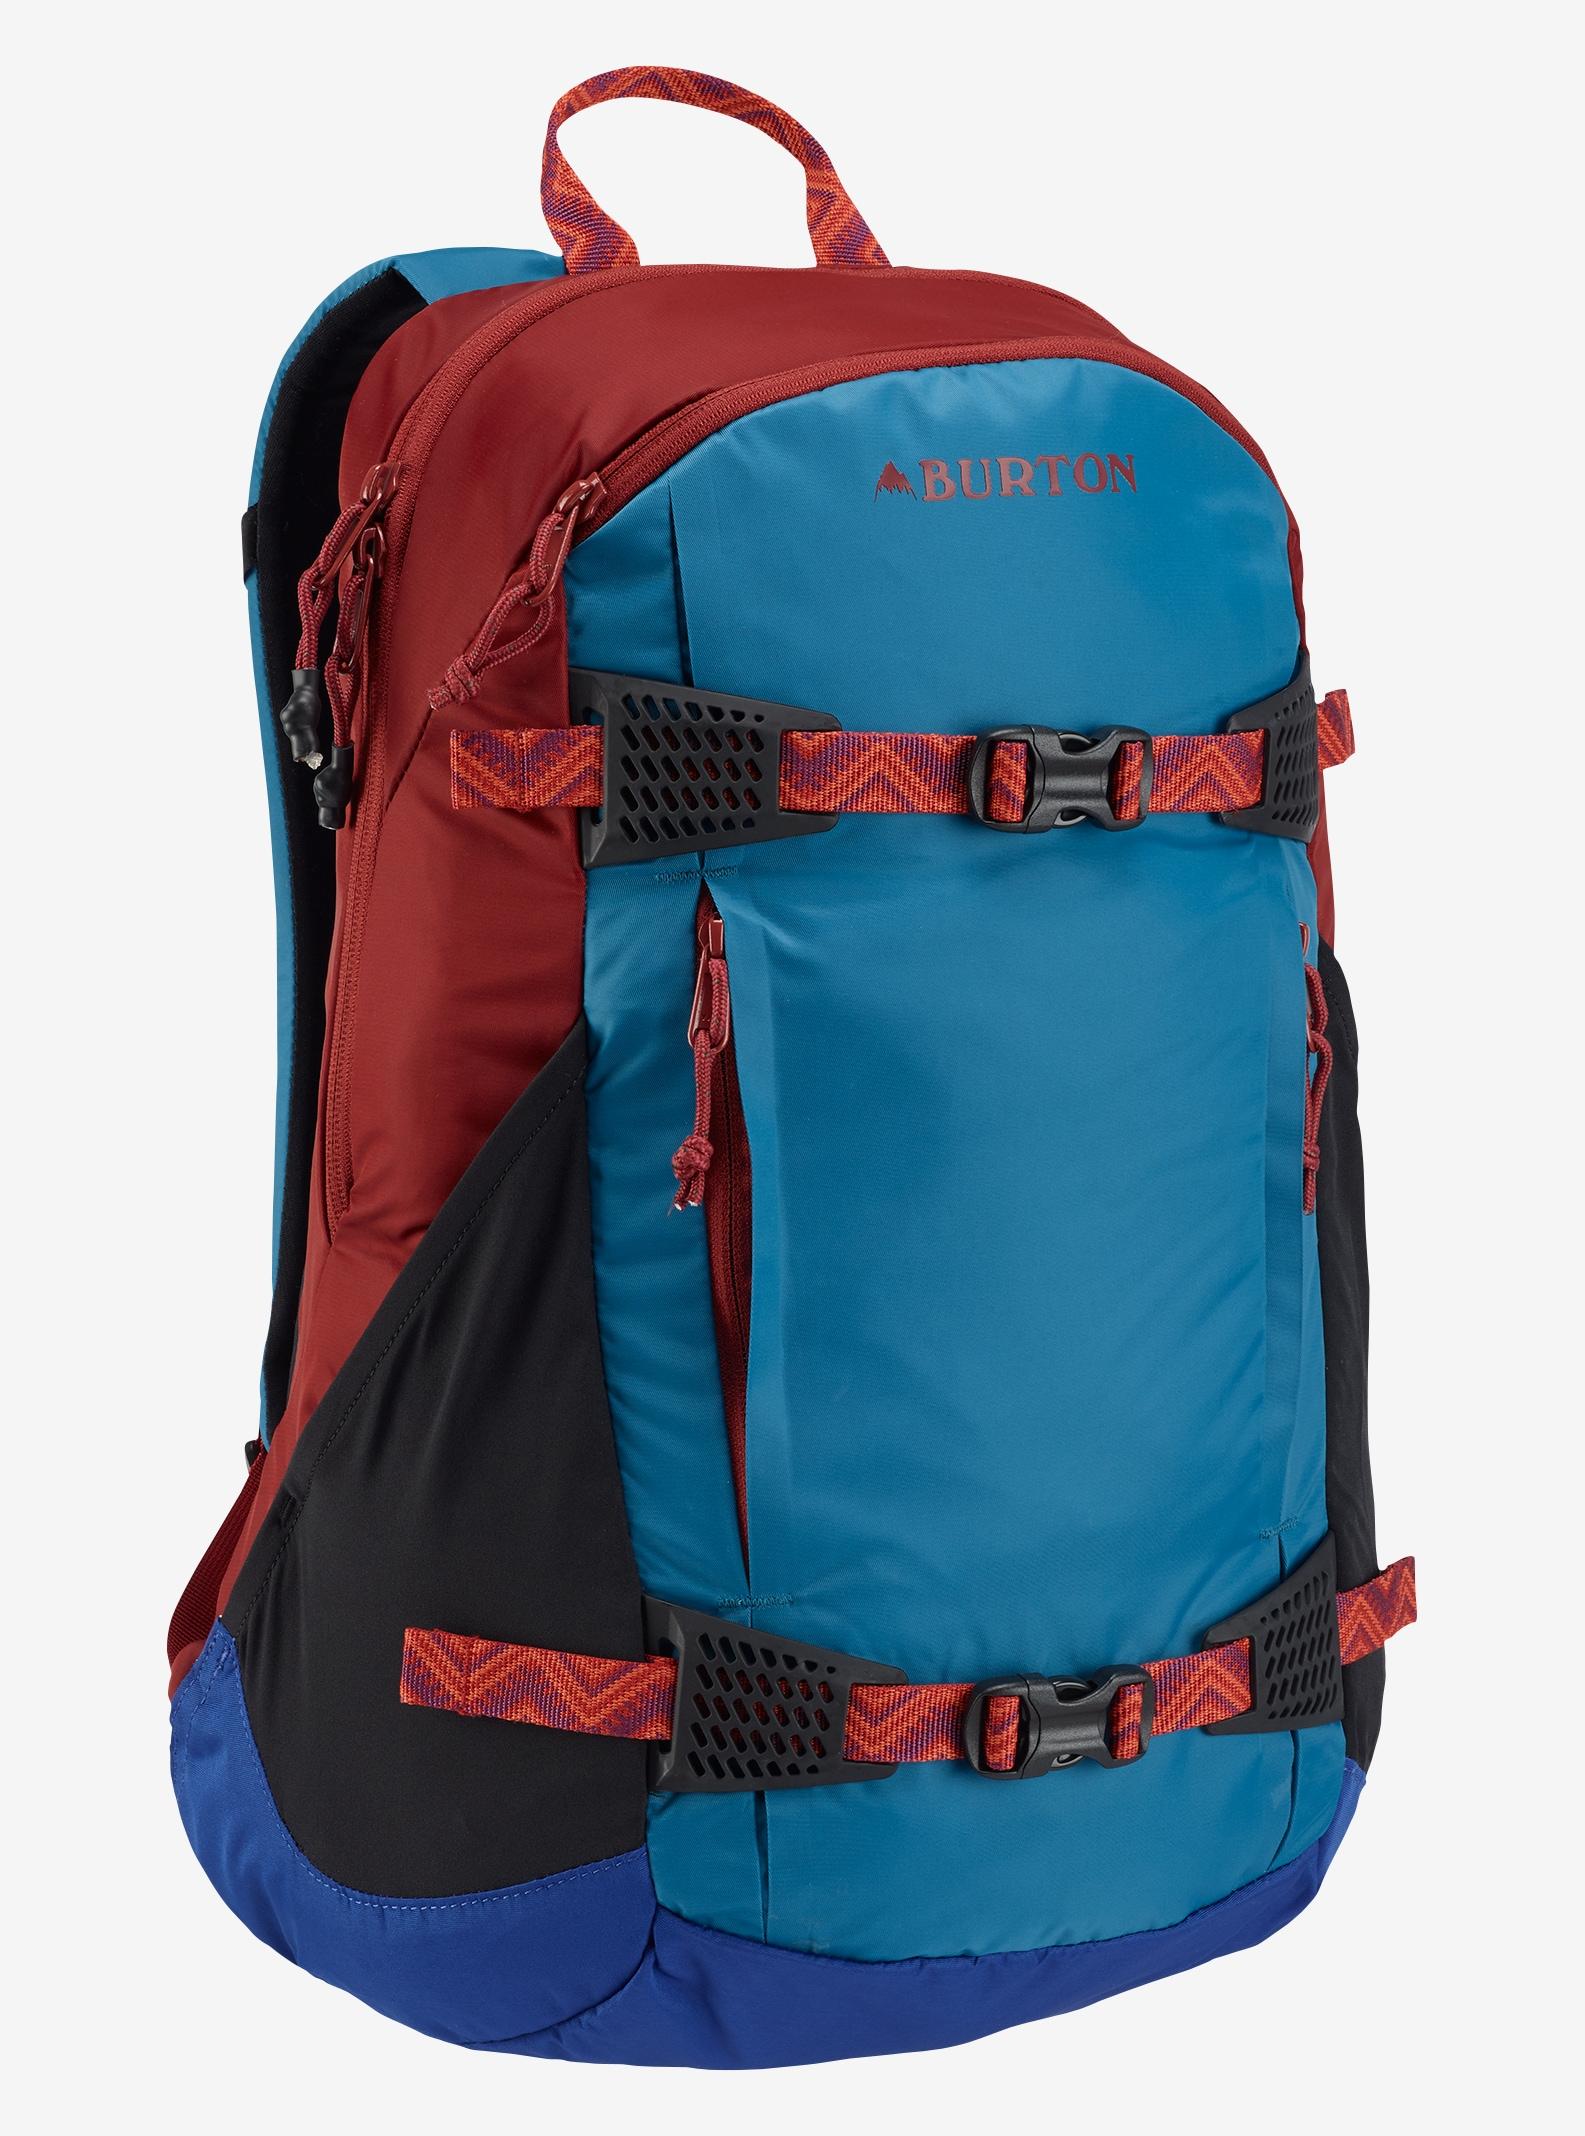 Burton Women's Day Hiker 23L Backpack shown in Jaded Flight Satin